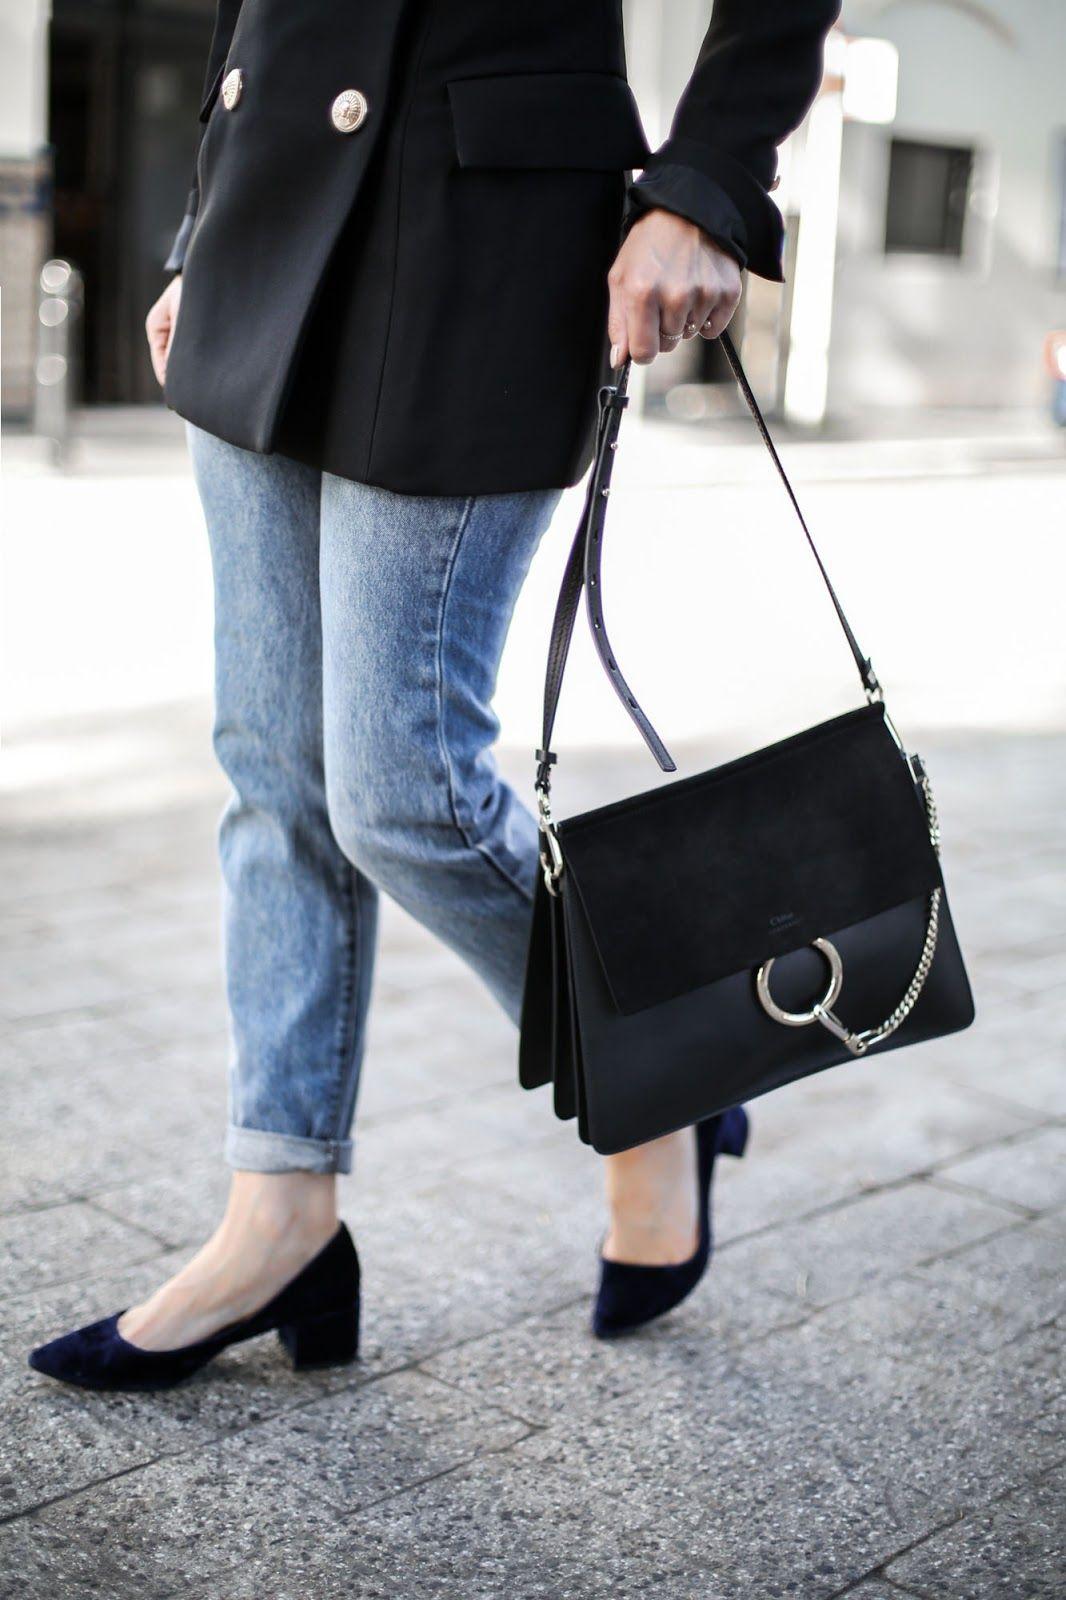 27c55f26c71 Chloe Faye worn by @bohotailor #chloe #chloefaye | Style Inspo ...